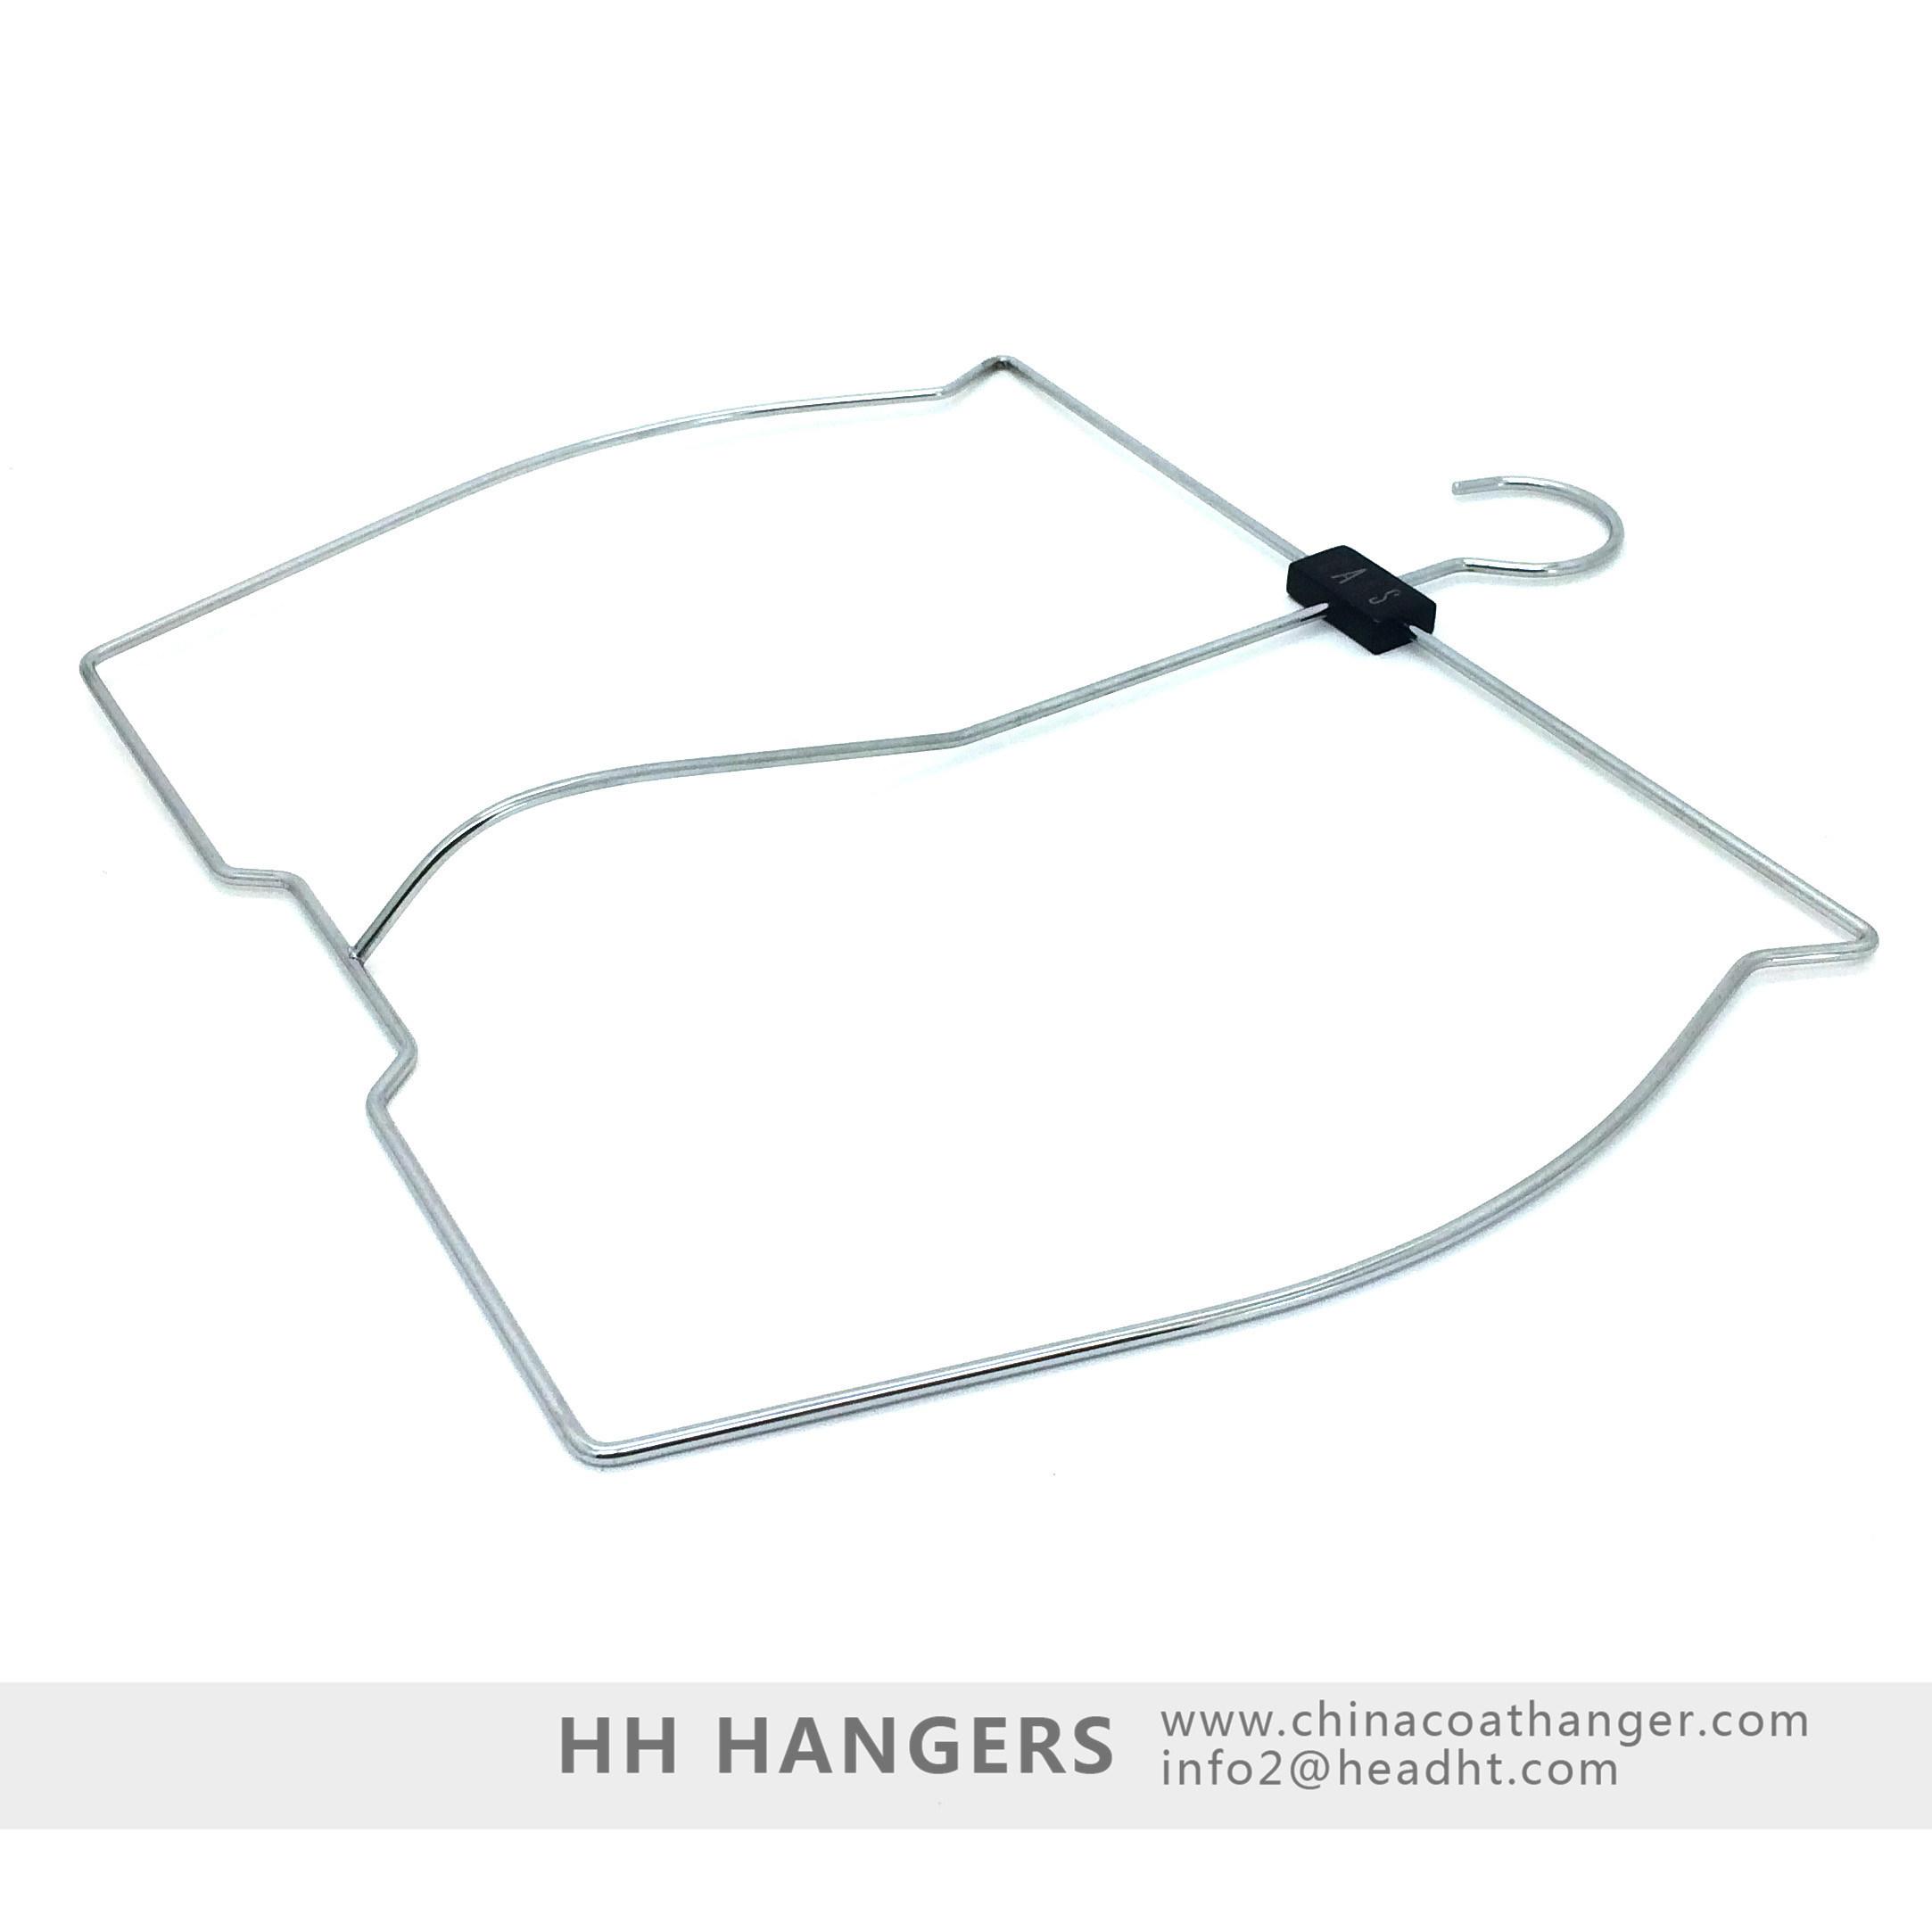 Logo Branded Men′s Shorts Swimming Wear Wet Suit Display Hanger